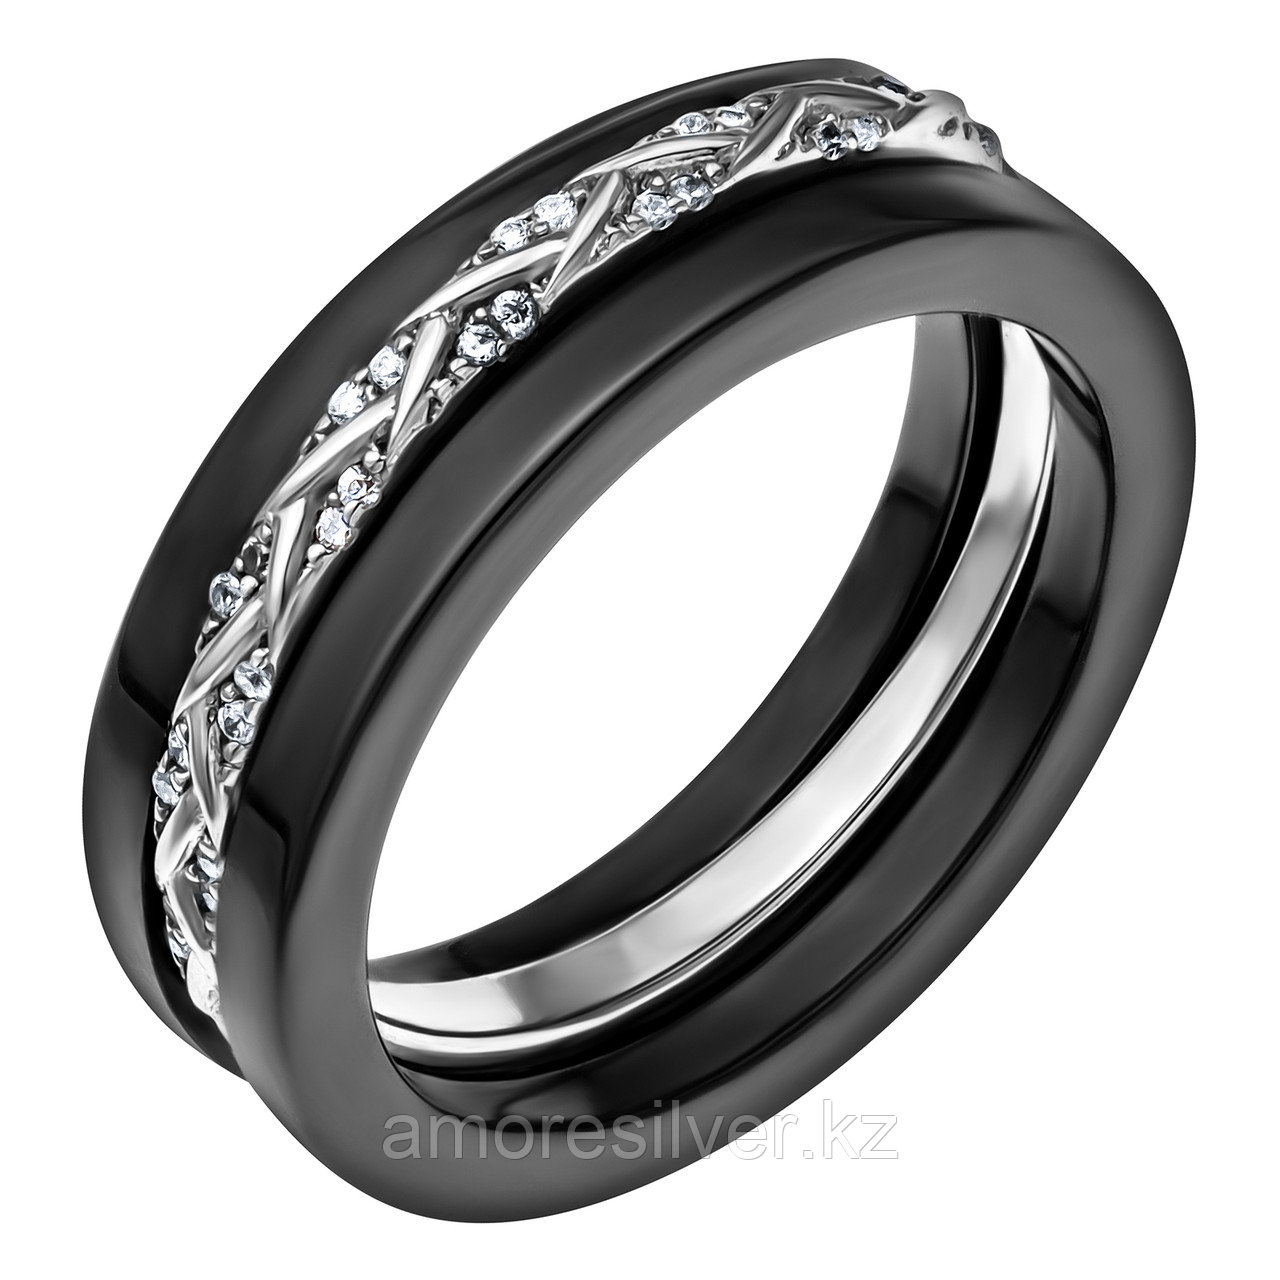 "Кольцо Teosa серебро с родием, керамика фианит, ""линии"" CS-419S-B"